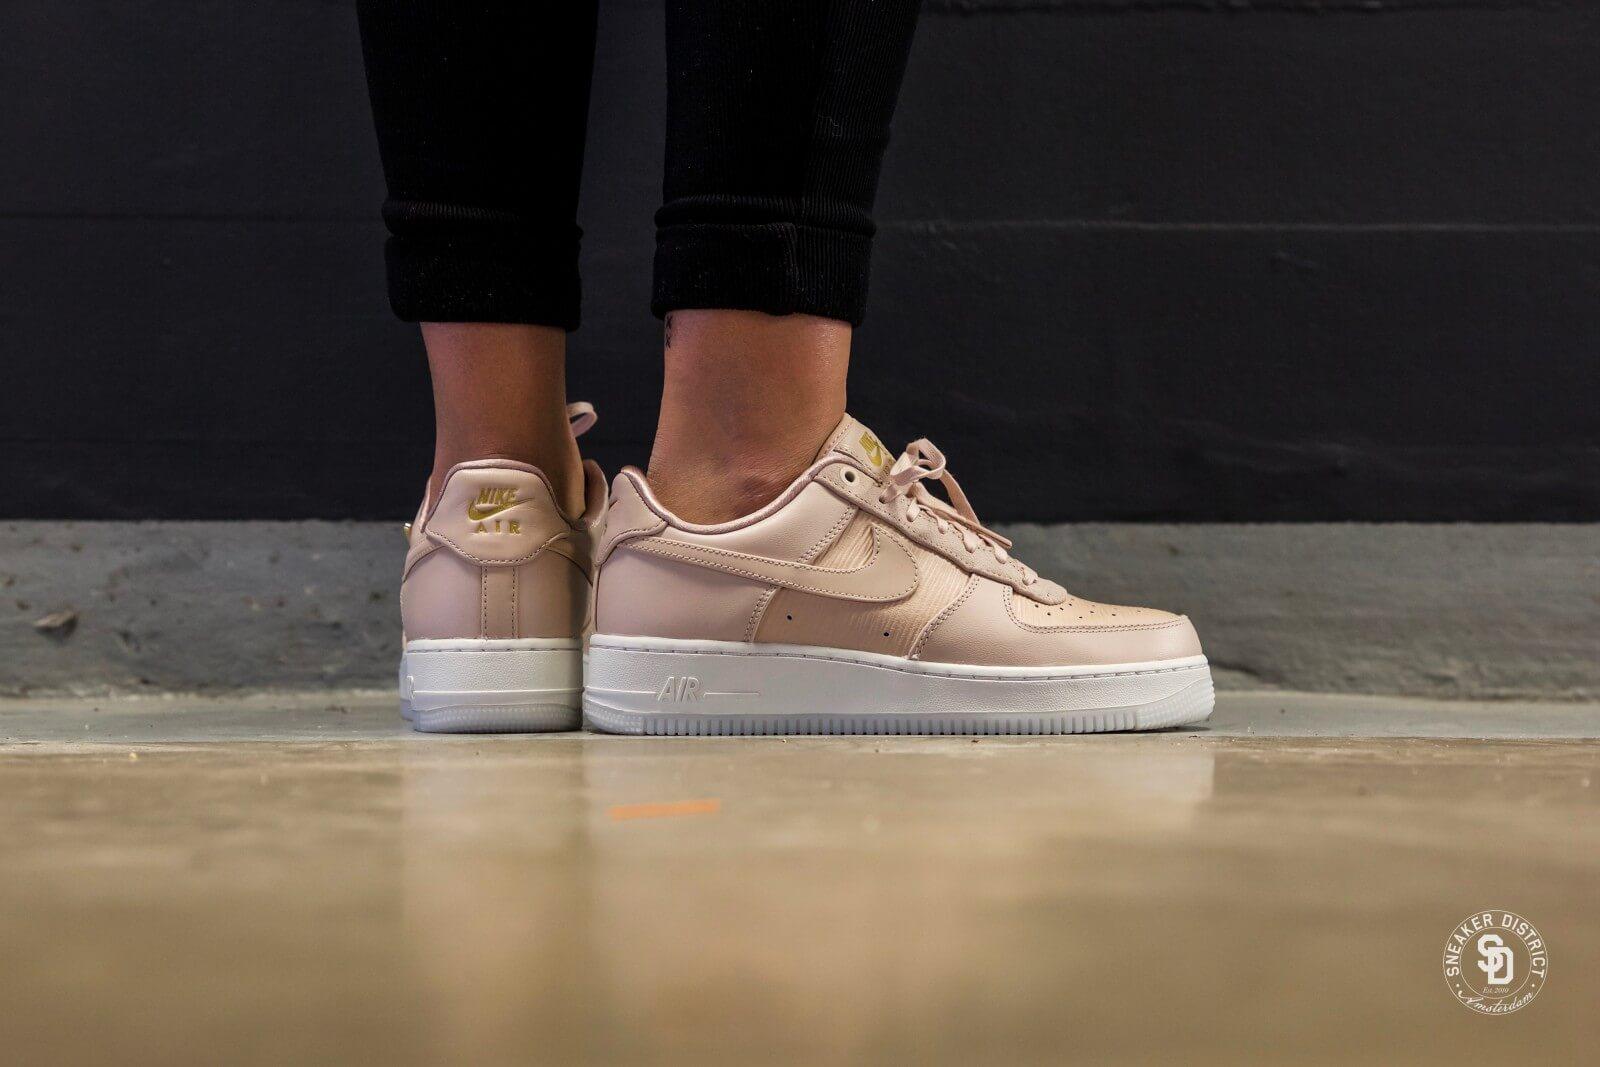 Nike Wmns Air Max 1 Premium Particle Beige Particle Beige Sneaker